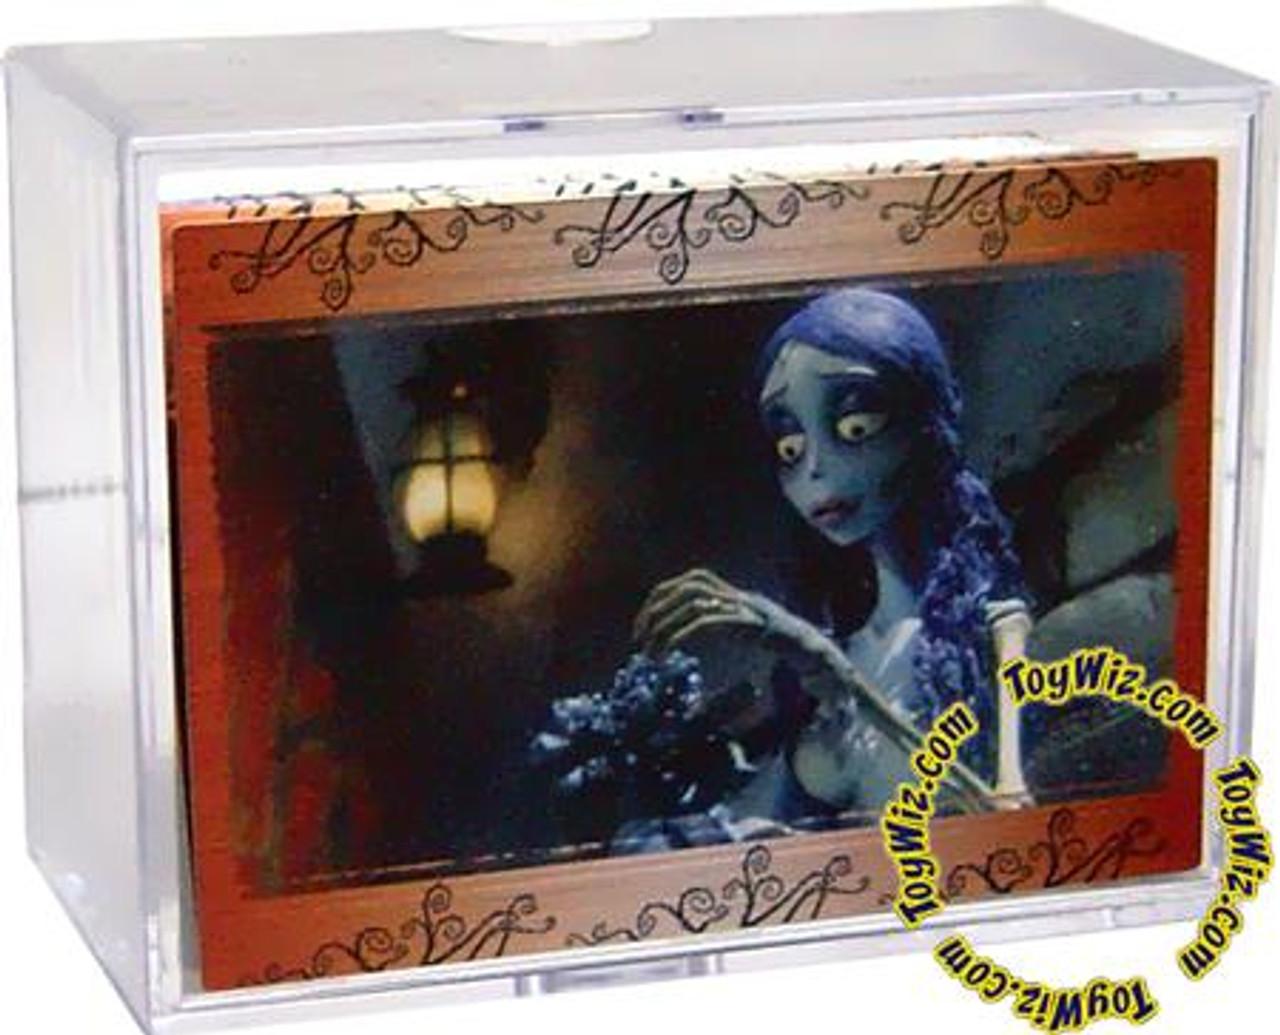 EnSky Japanese Corpse Bride Trading Card Set